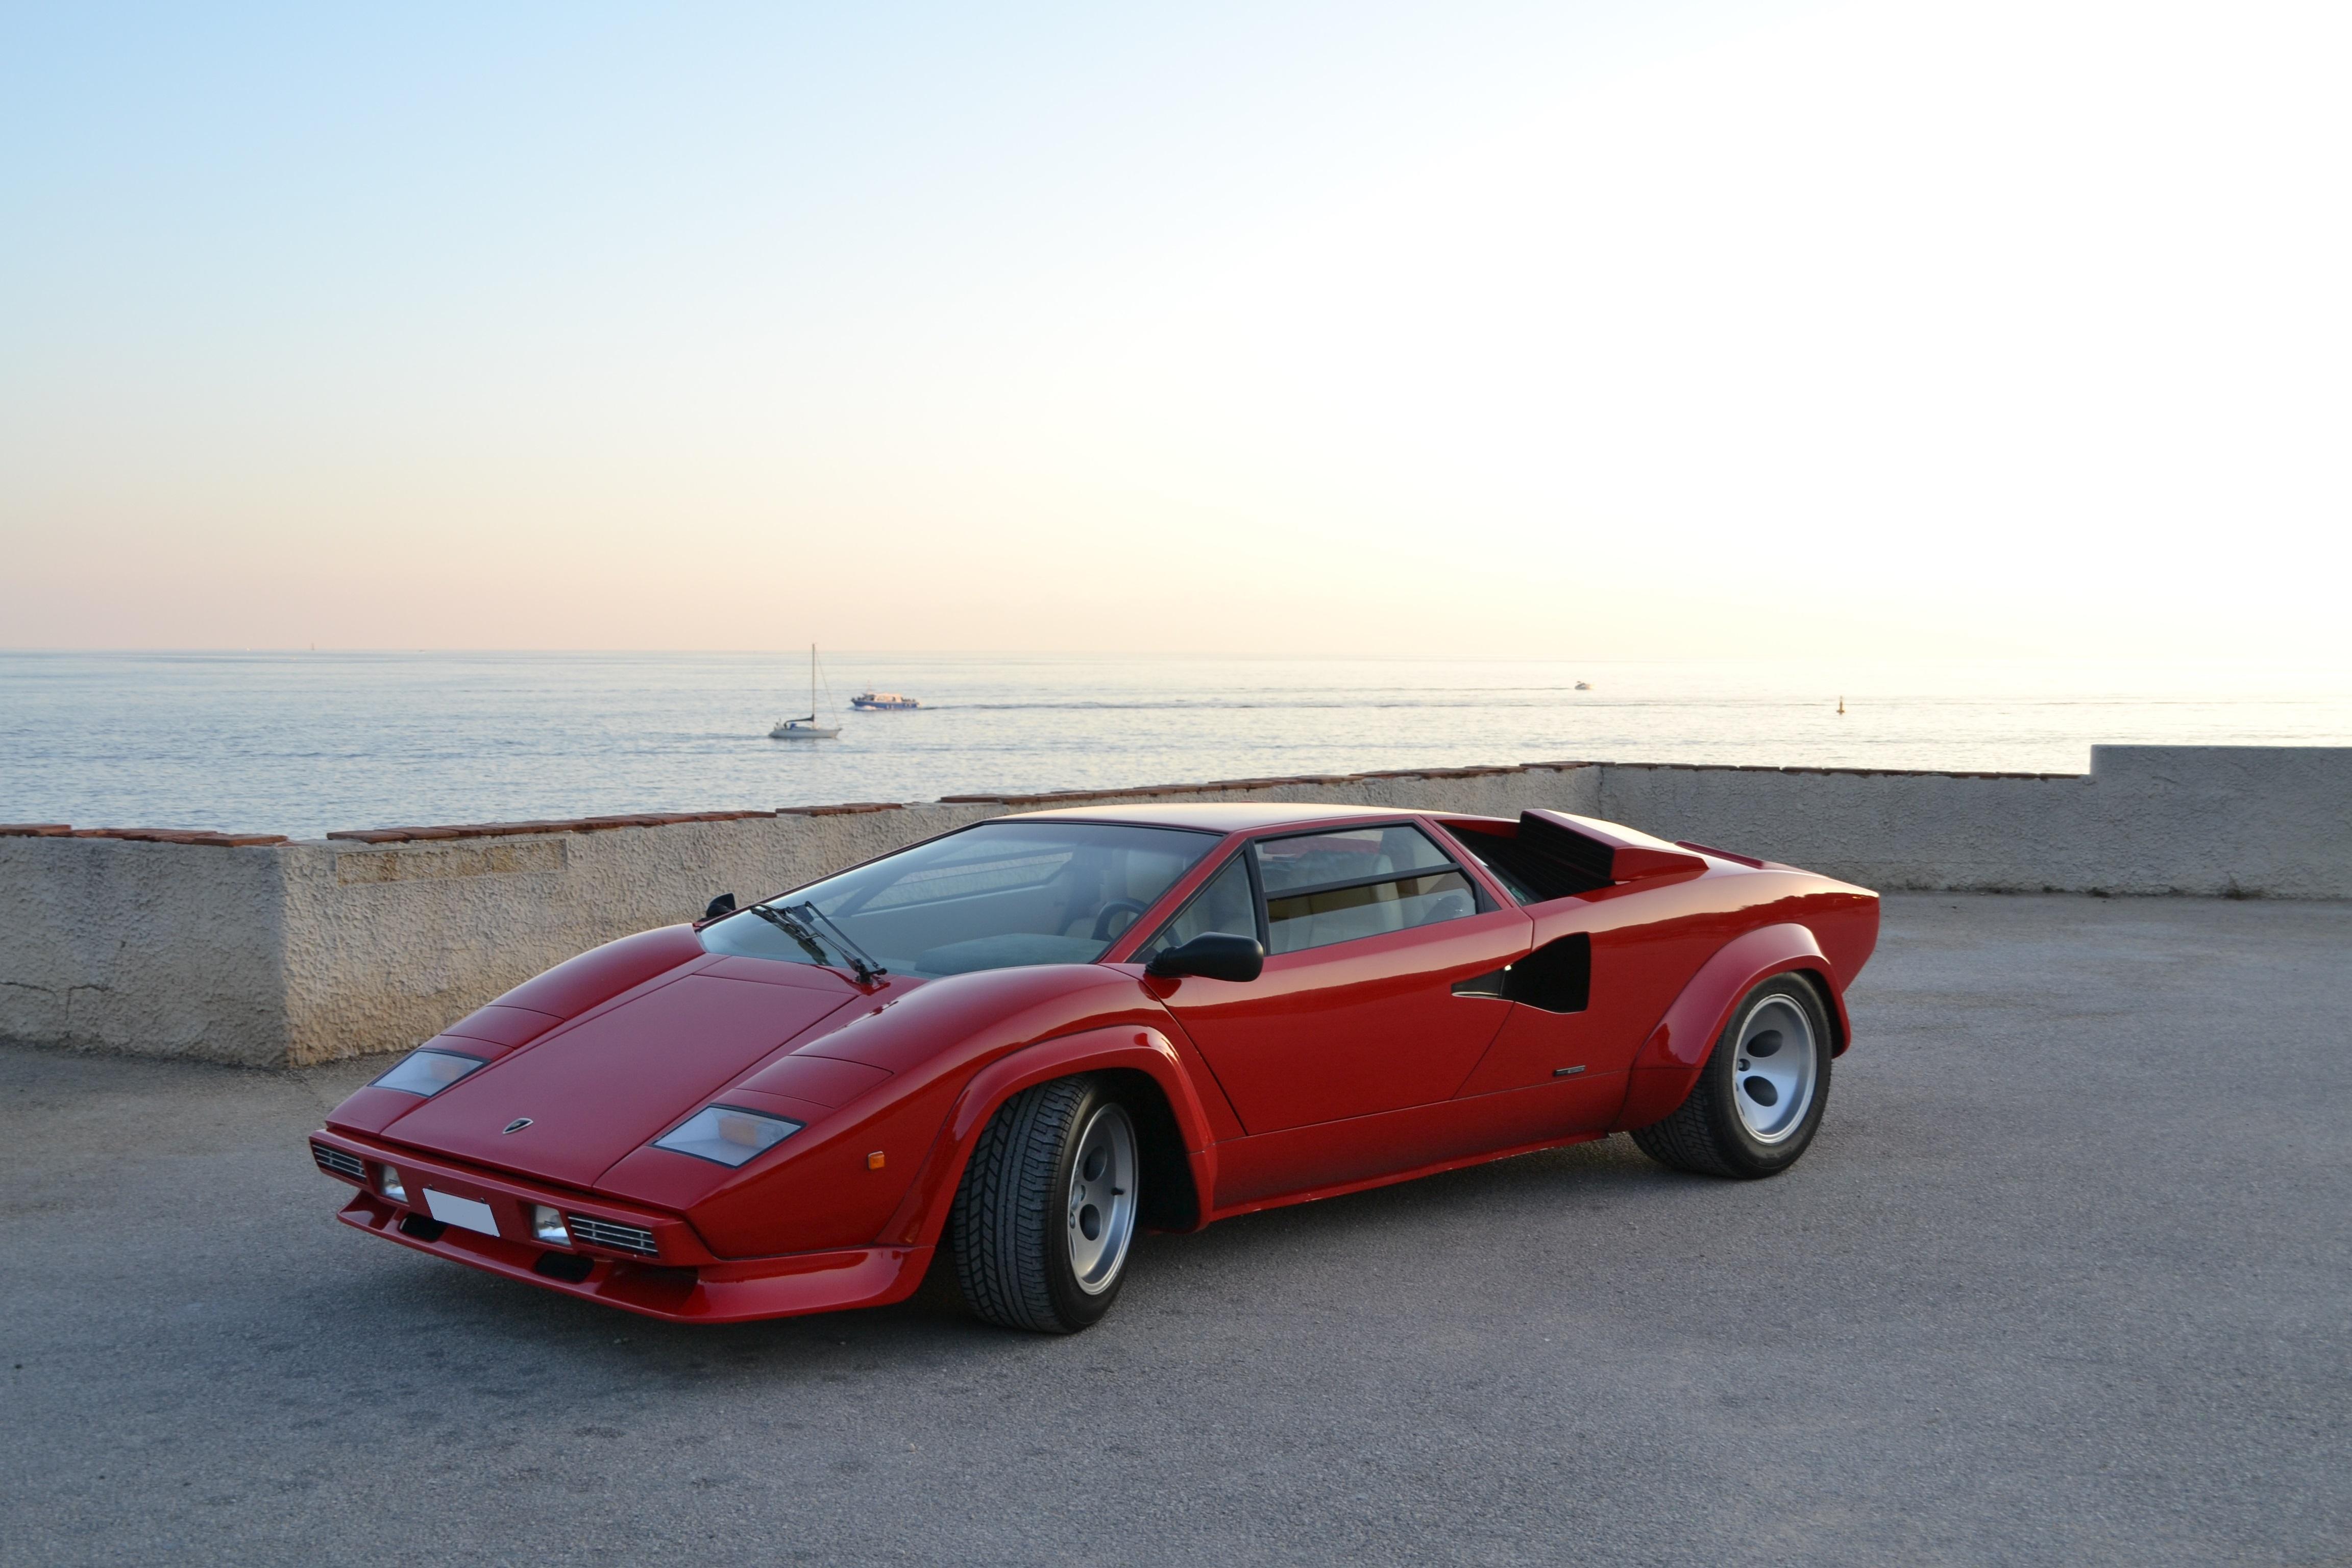 lamborghini_countach_lp400s_4 Cool Lamborghini Countach Diecast 1 18 Cars Trend